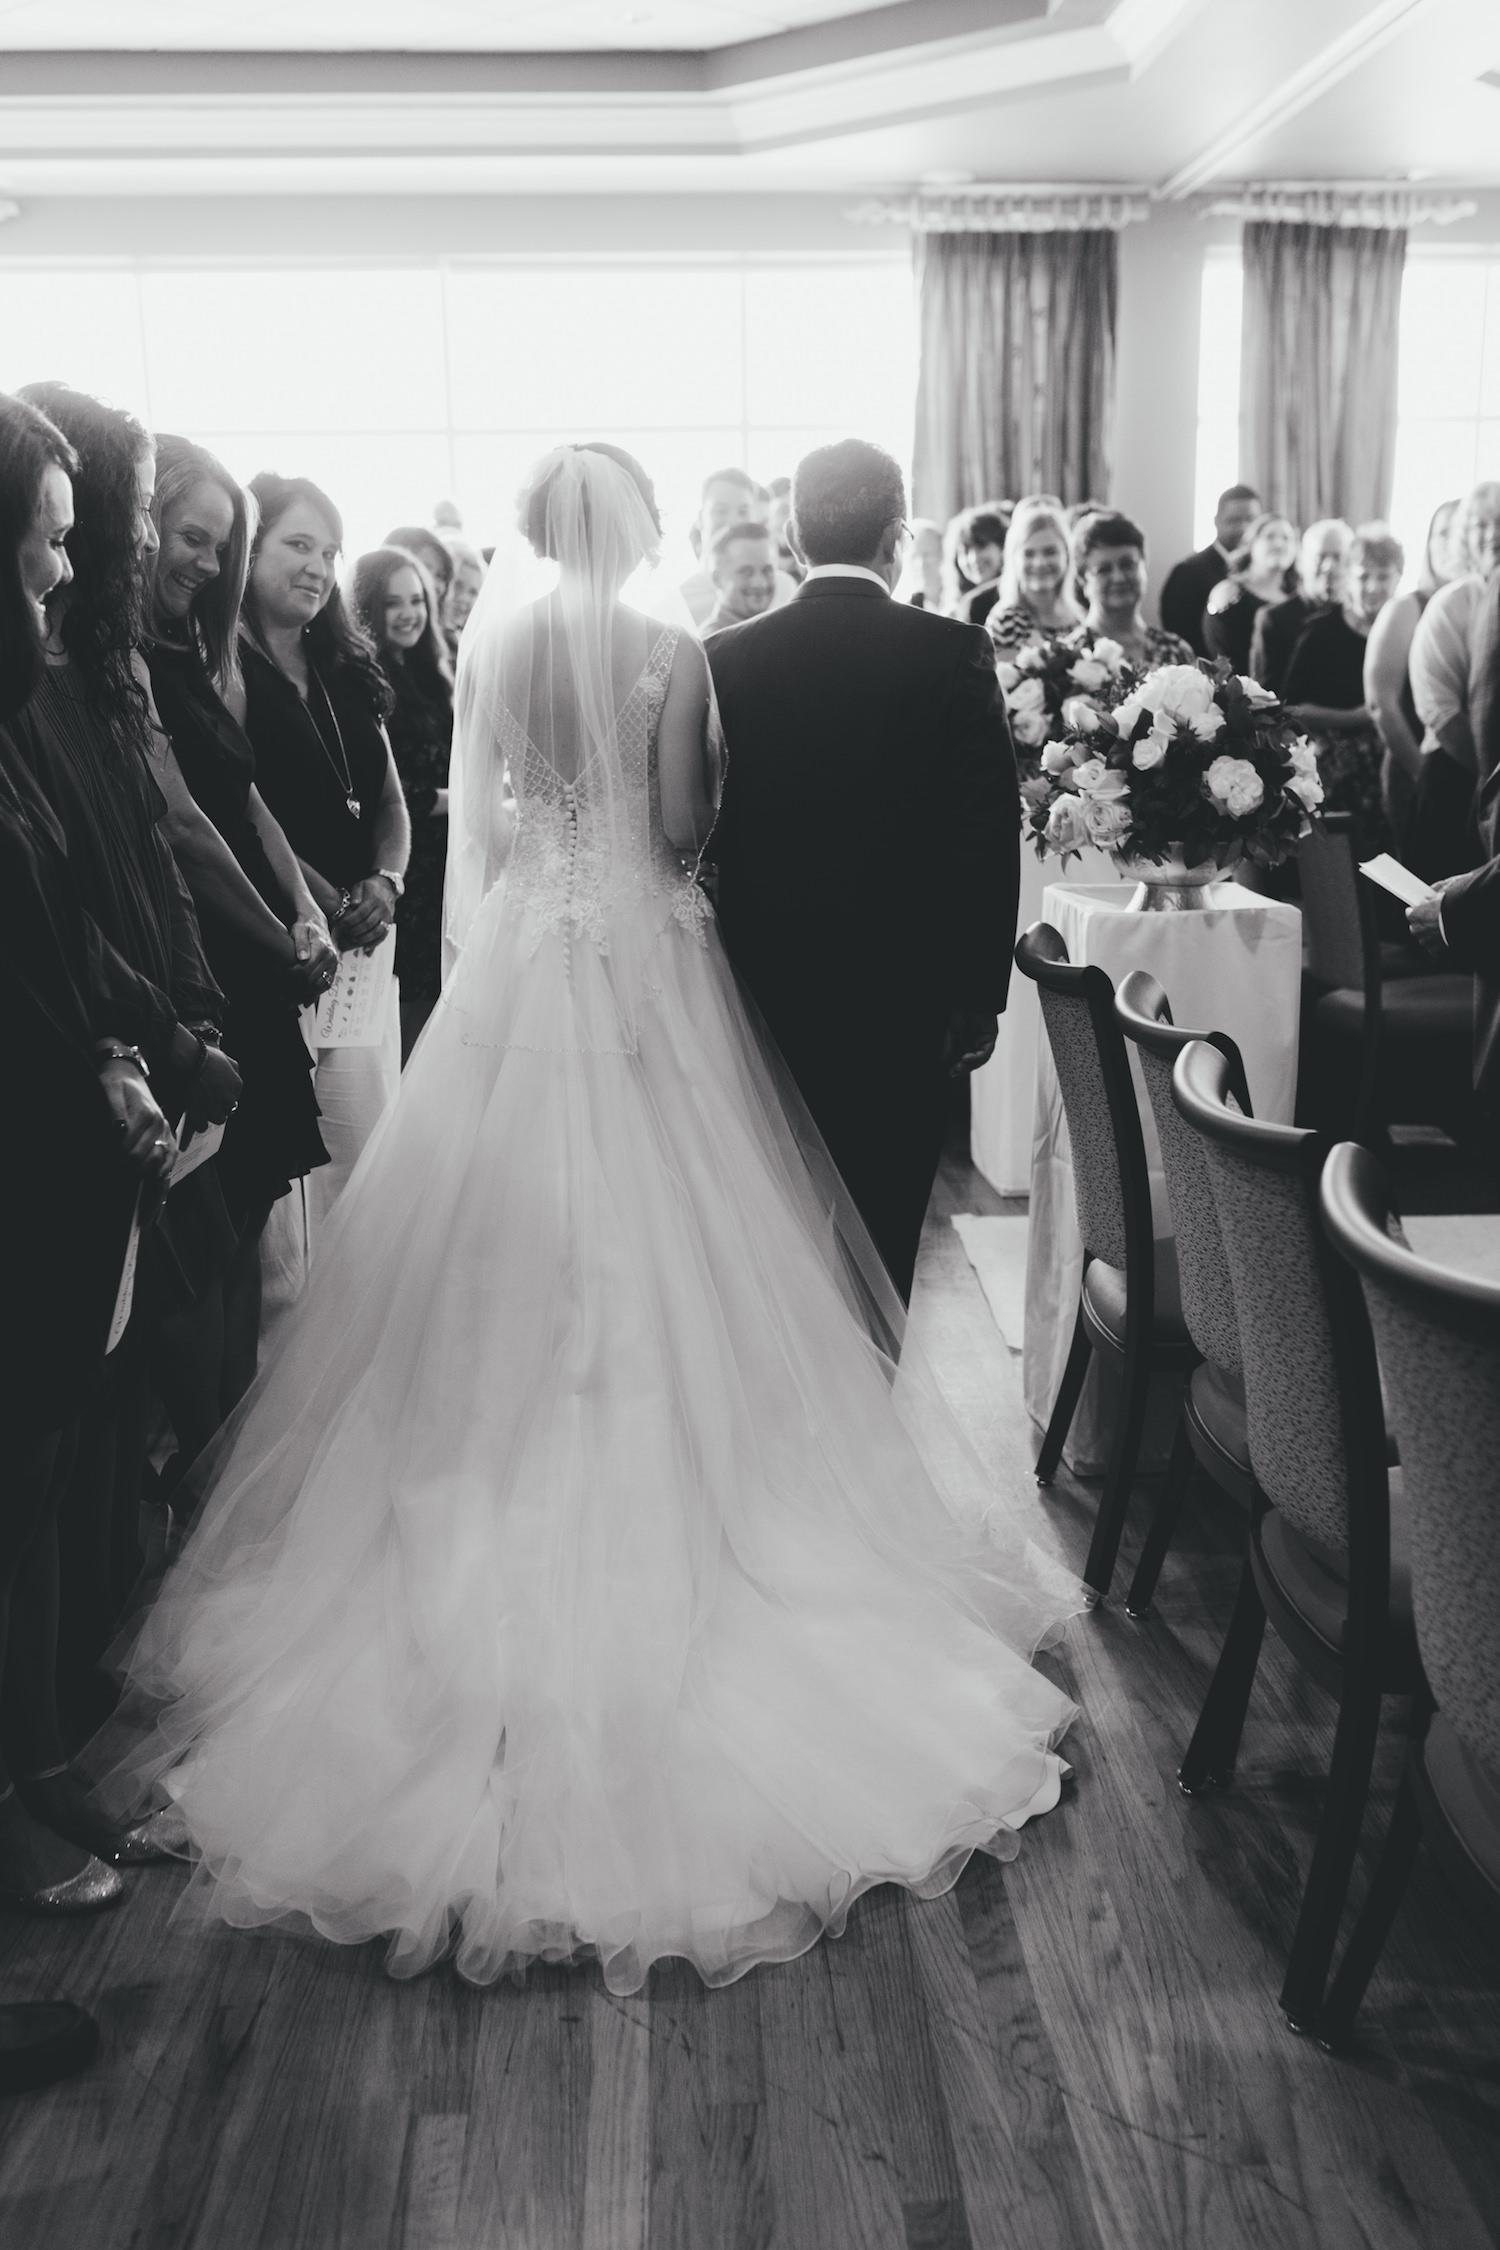 Jared _ Melissa - Ceremony - Jake _ Katie Photography_071.jpg